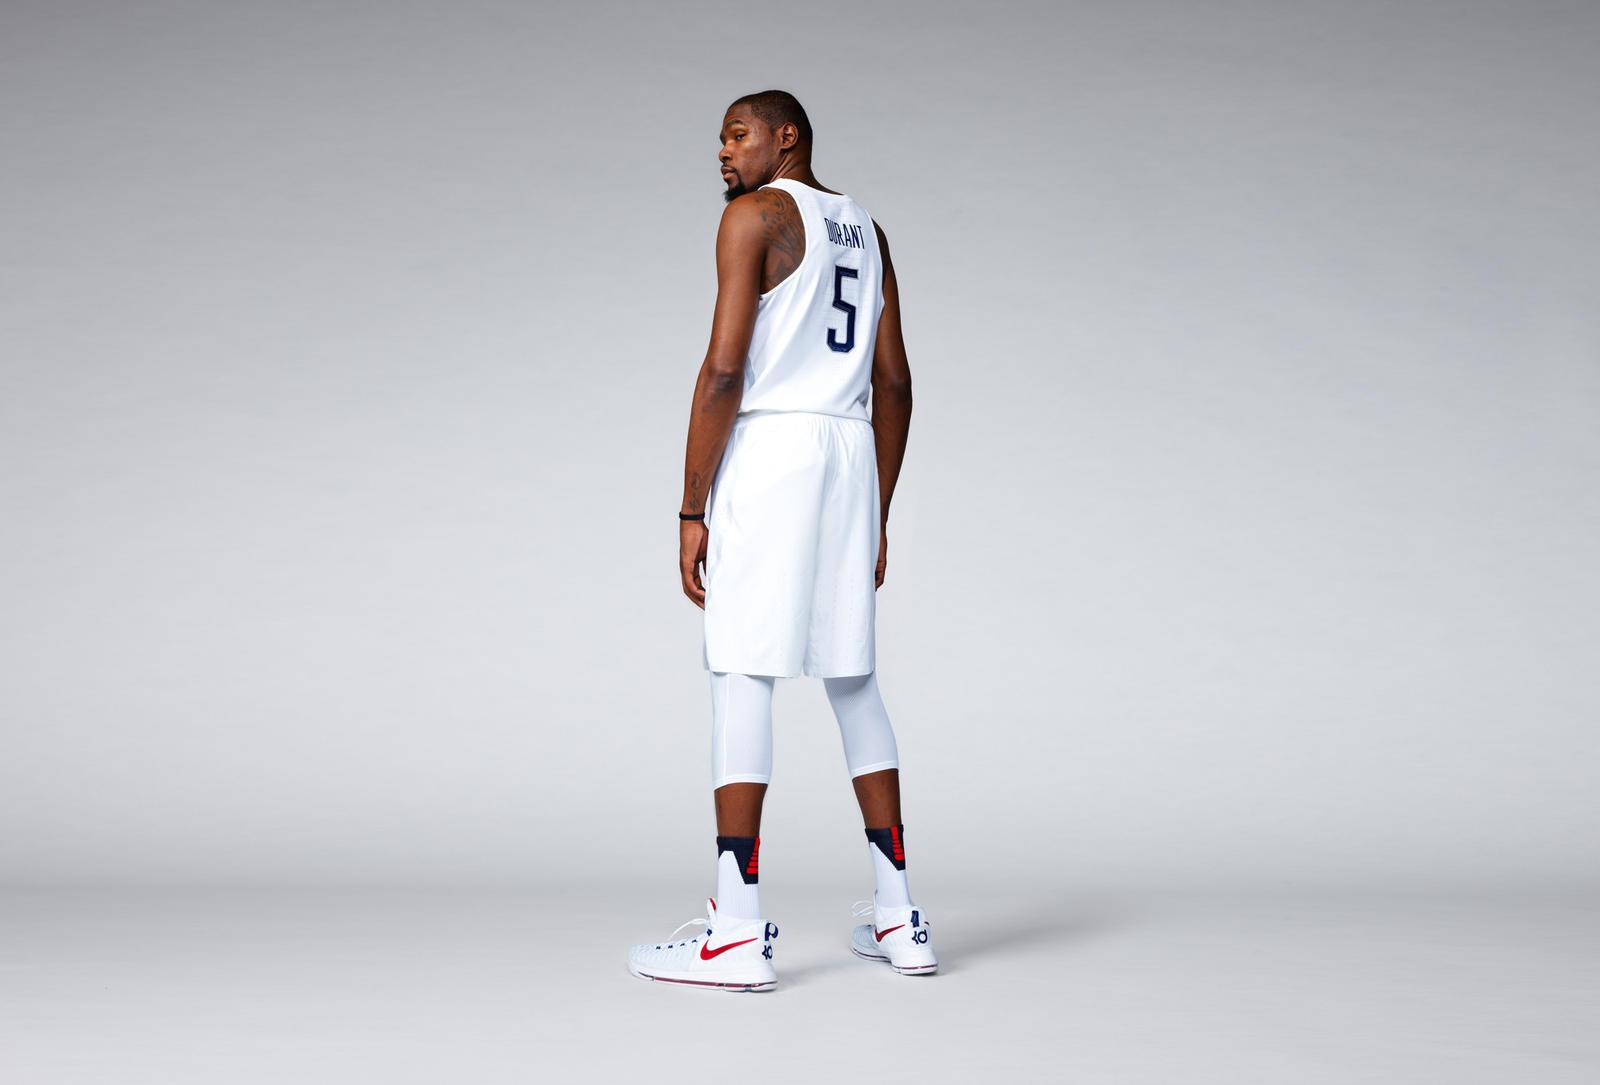 basketball jersey design maker application free download